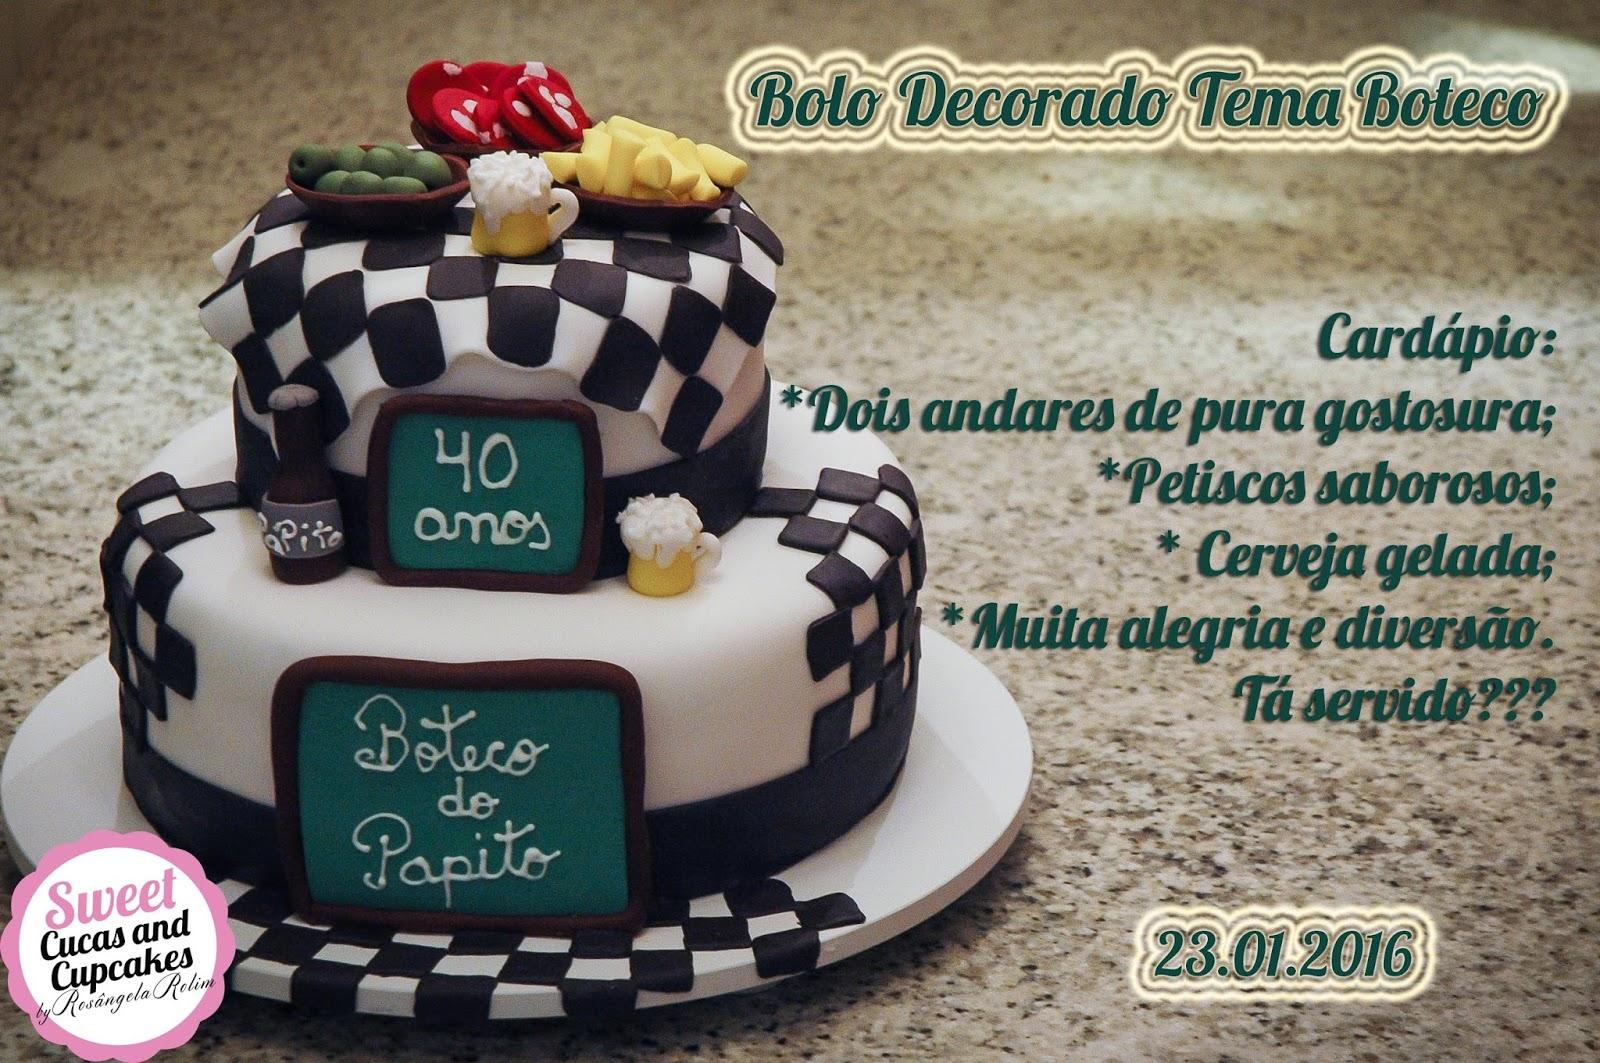 Sweet Cucas and Cupcakes by Rosângela Rolim: Bolo Decorado